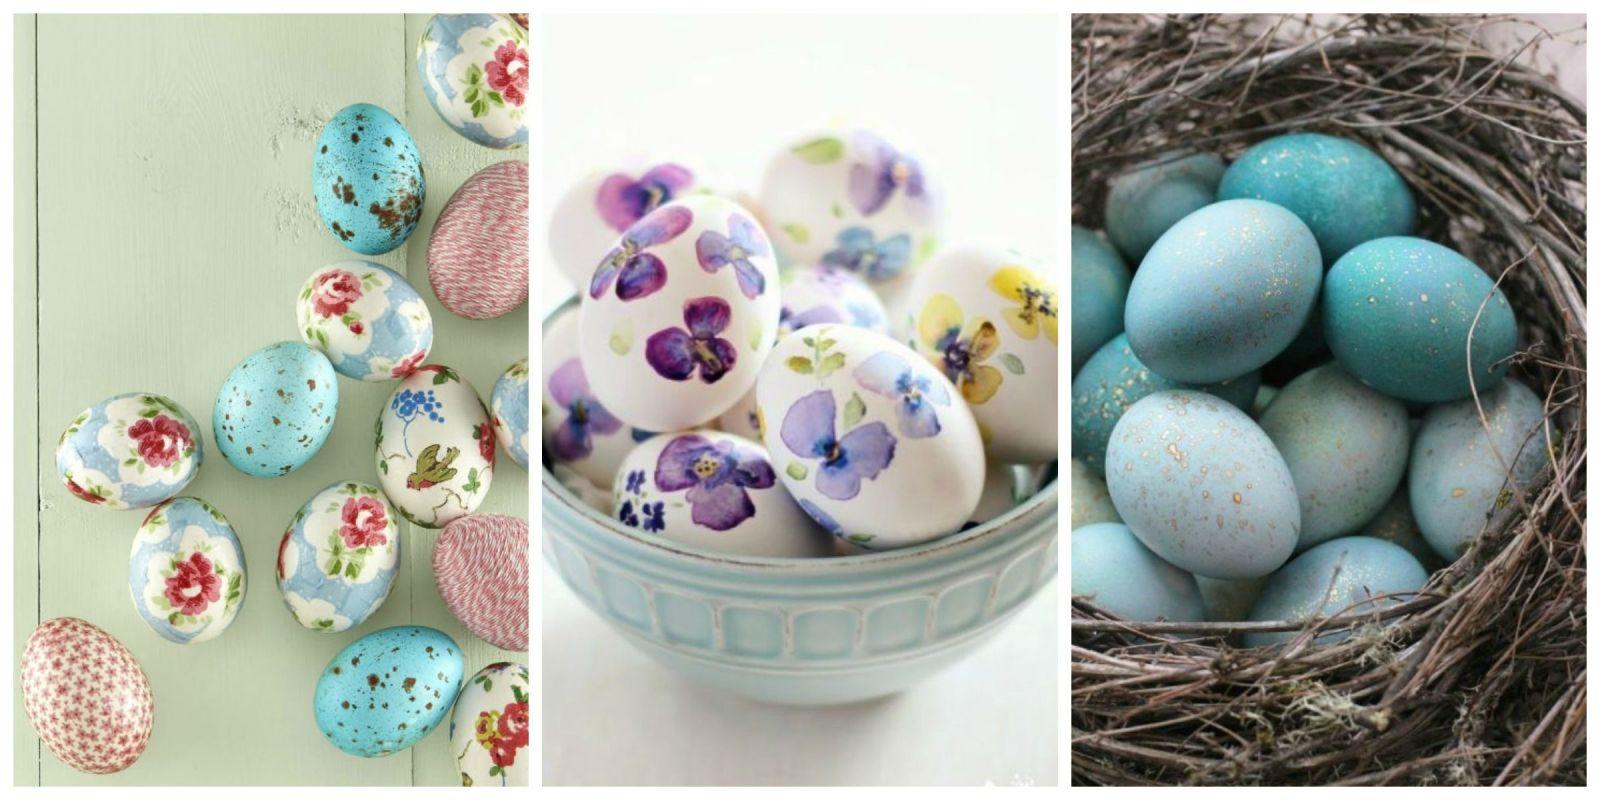 60 Fun Easter Egg Designs